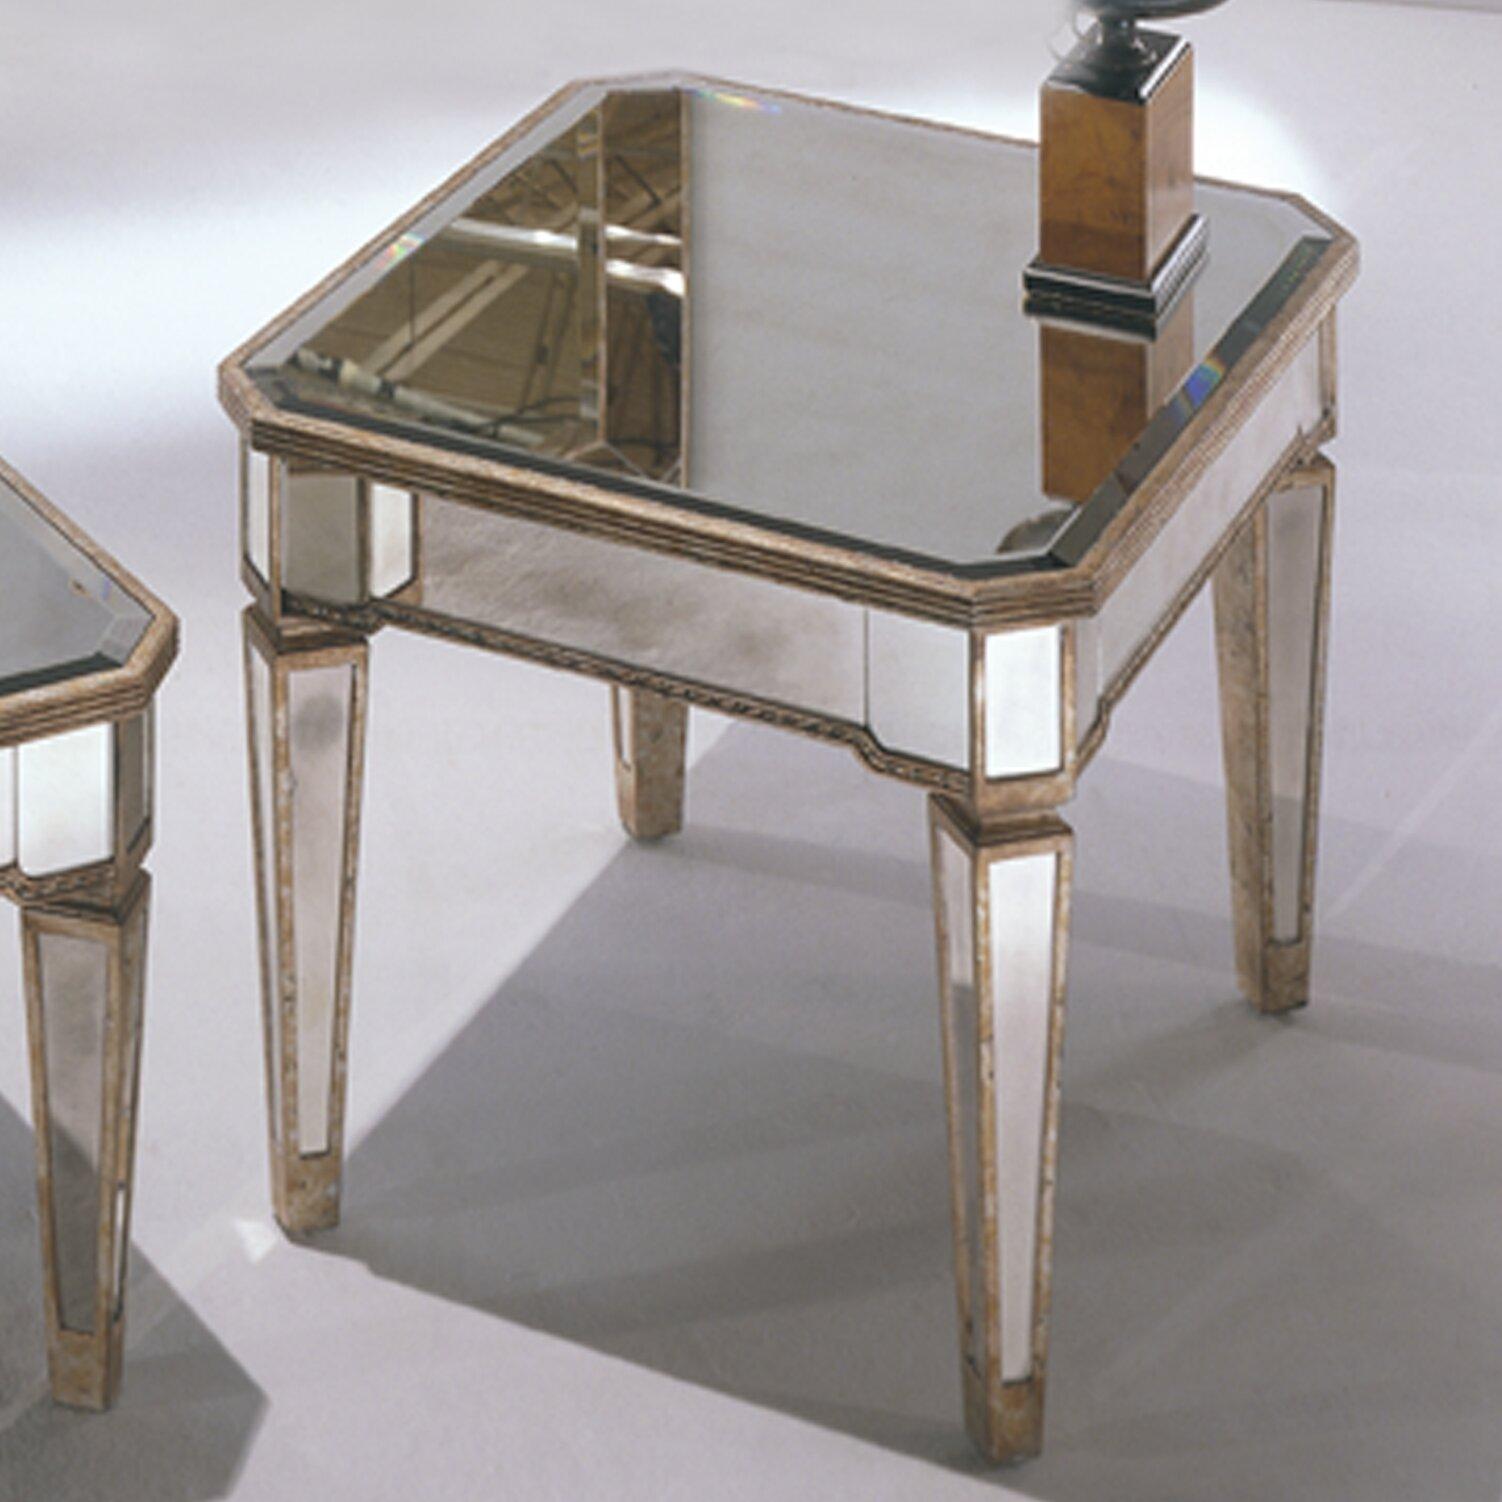 House Of Hampton Sandbach Mirrored Rectangle End Table In